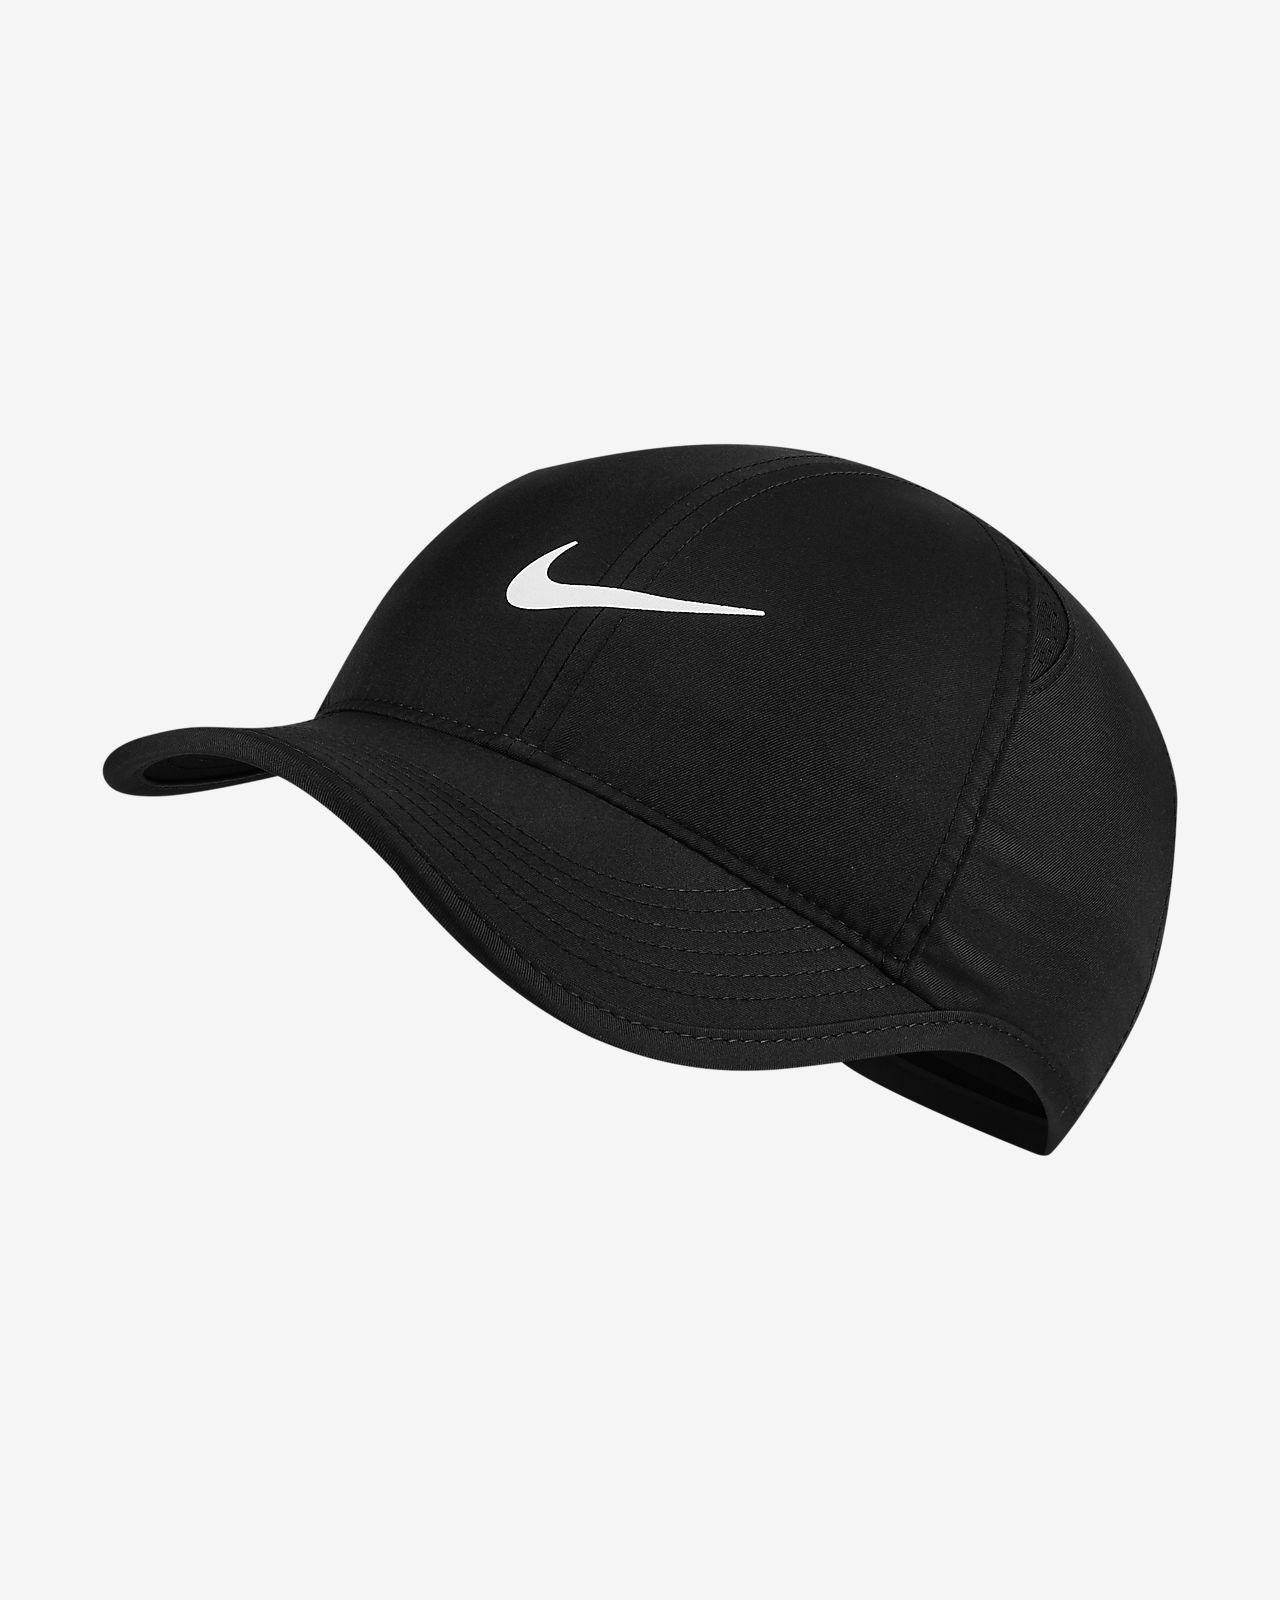 Nike Sportswear AeroBill Featherlight Women's Adjustable Cap